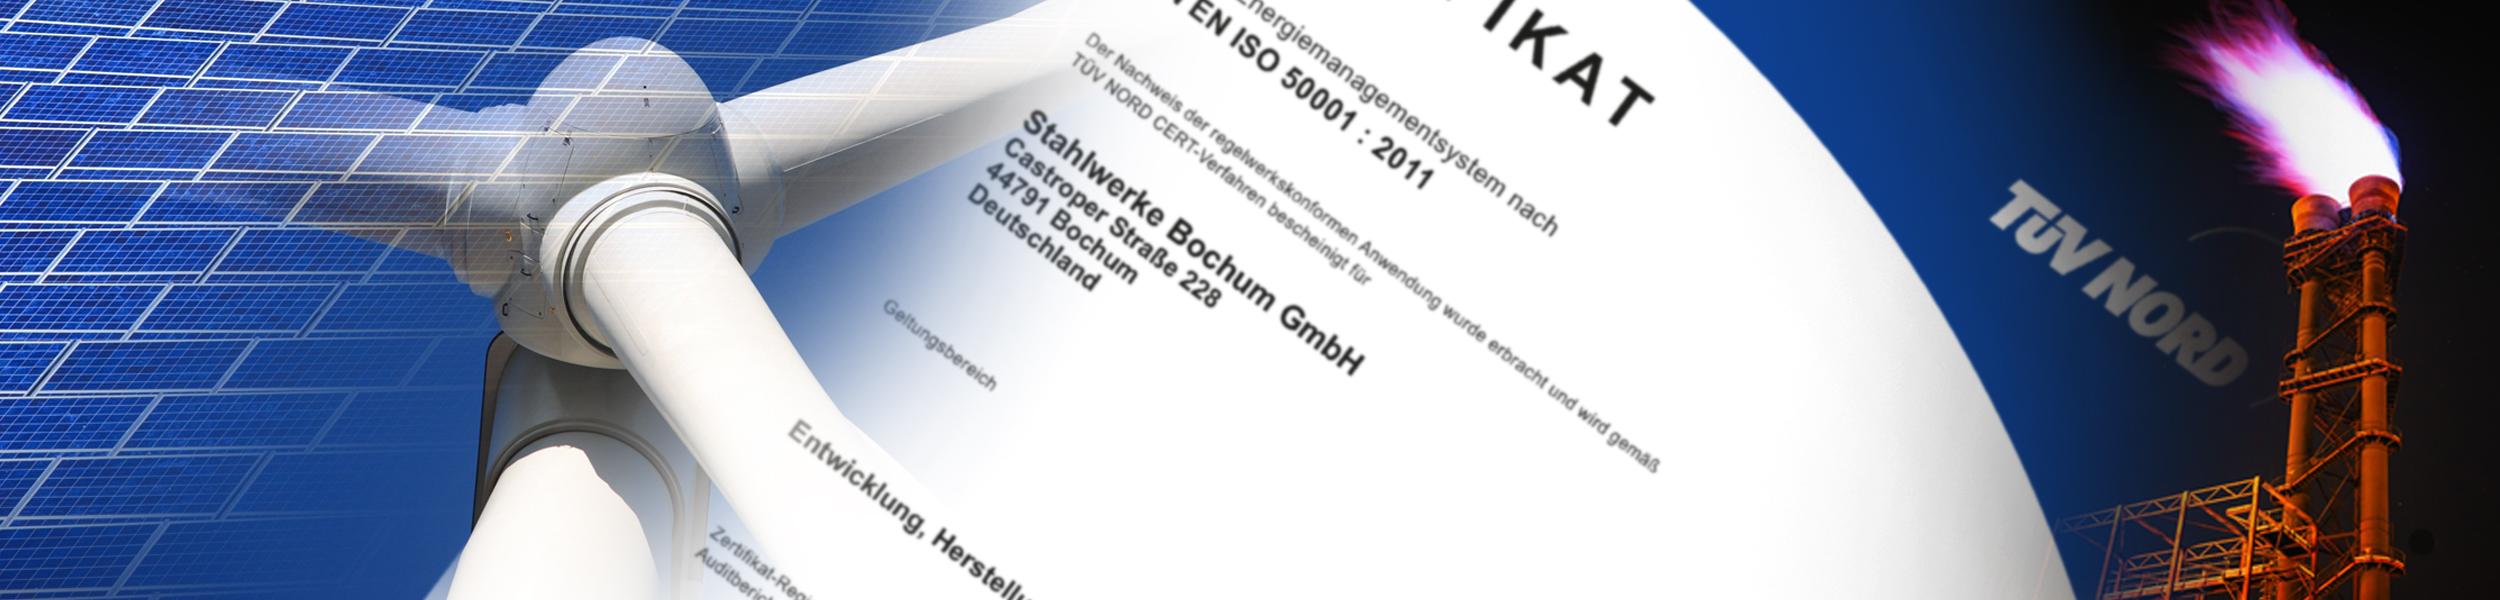 Energiepolitik - Titelbild zeigt Ausschnitt Zertifikat